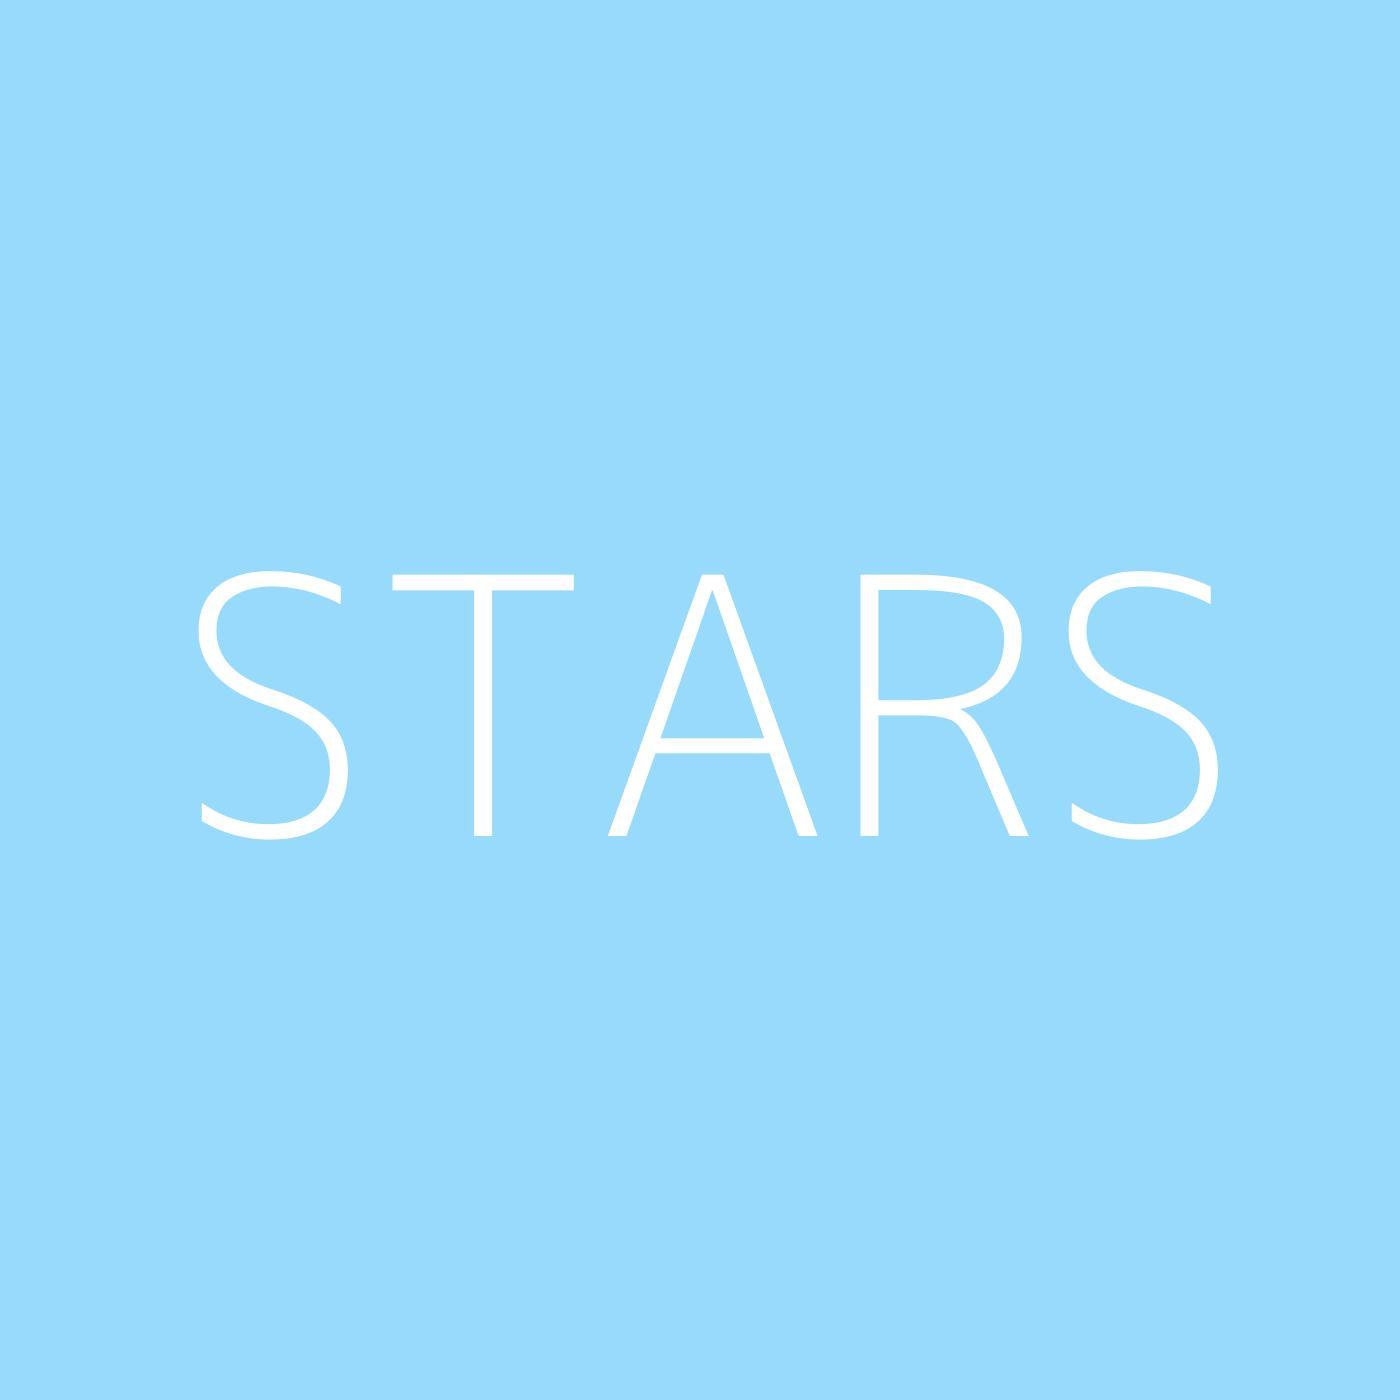 Stars Playlist Artwork